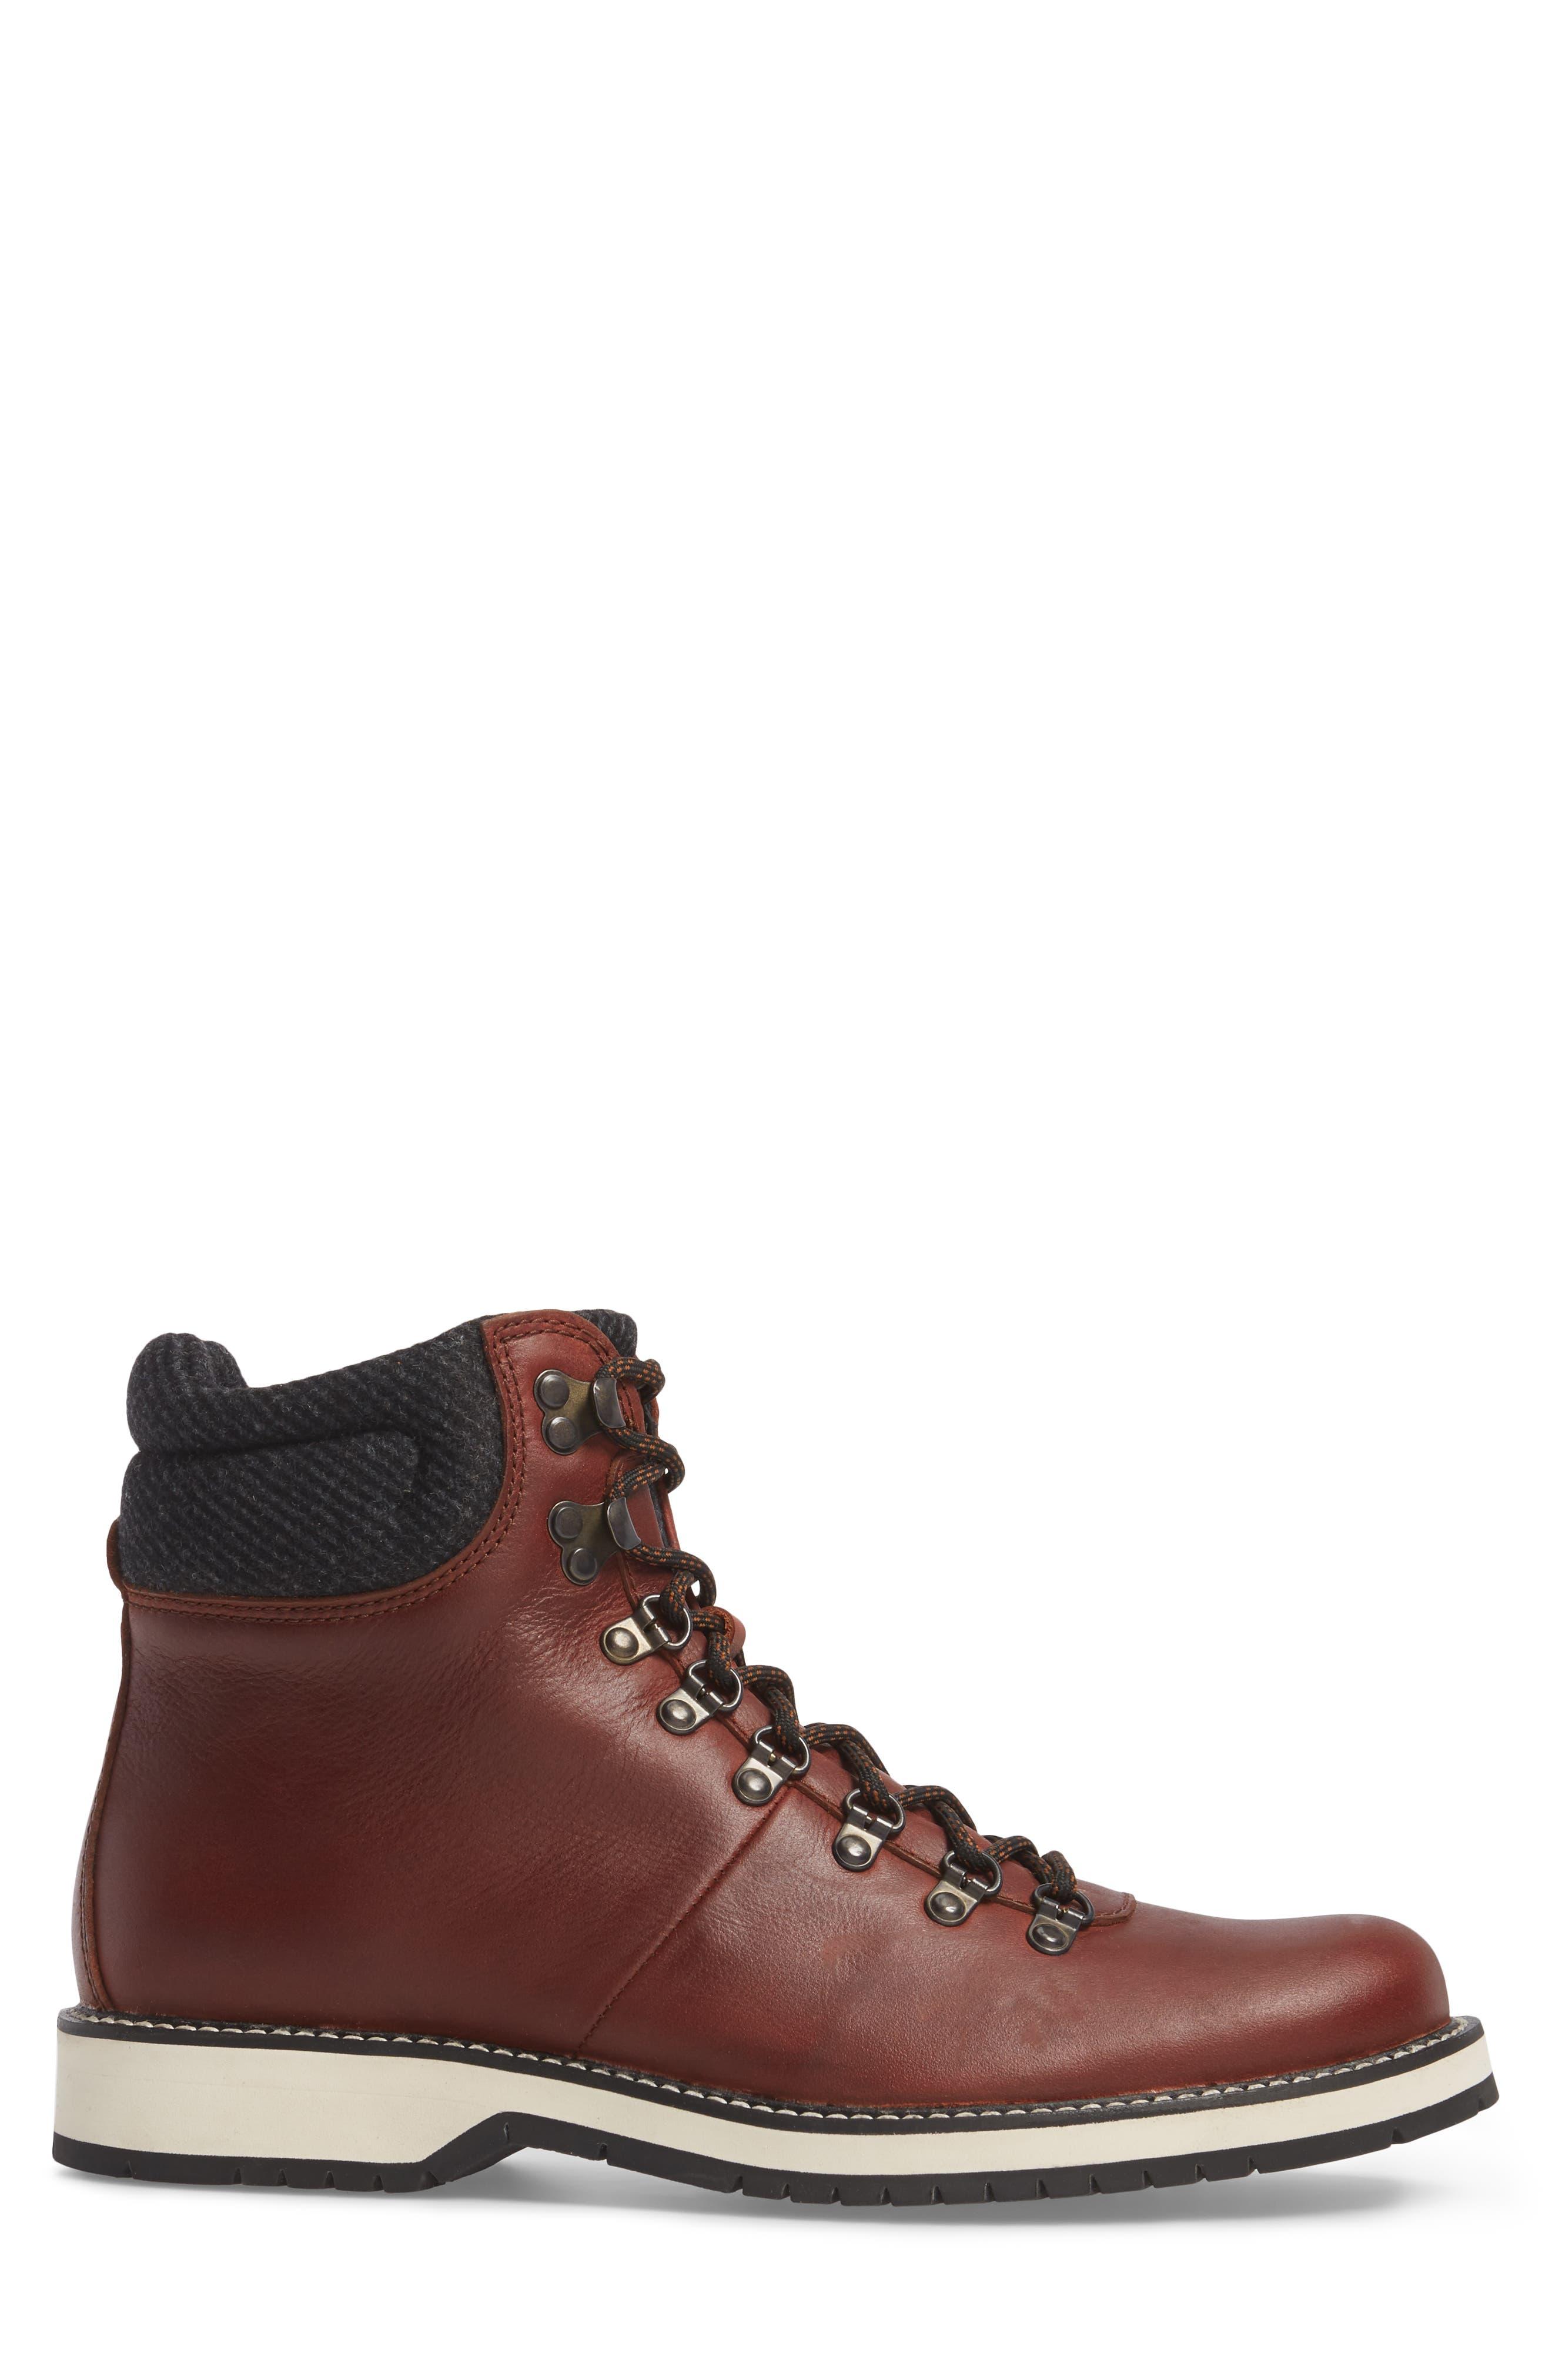 Sidney Waterproof Plain Toe Boot,                             Alternate thumbnail 3, color,                             Brown